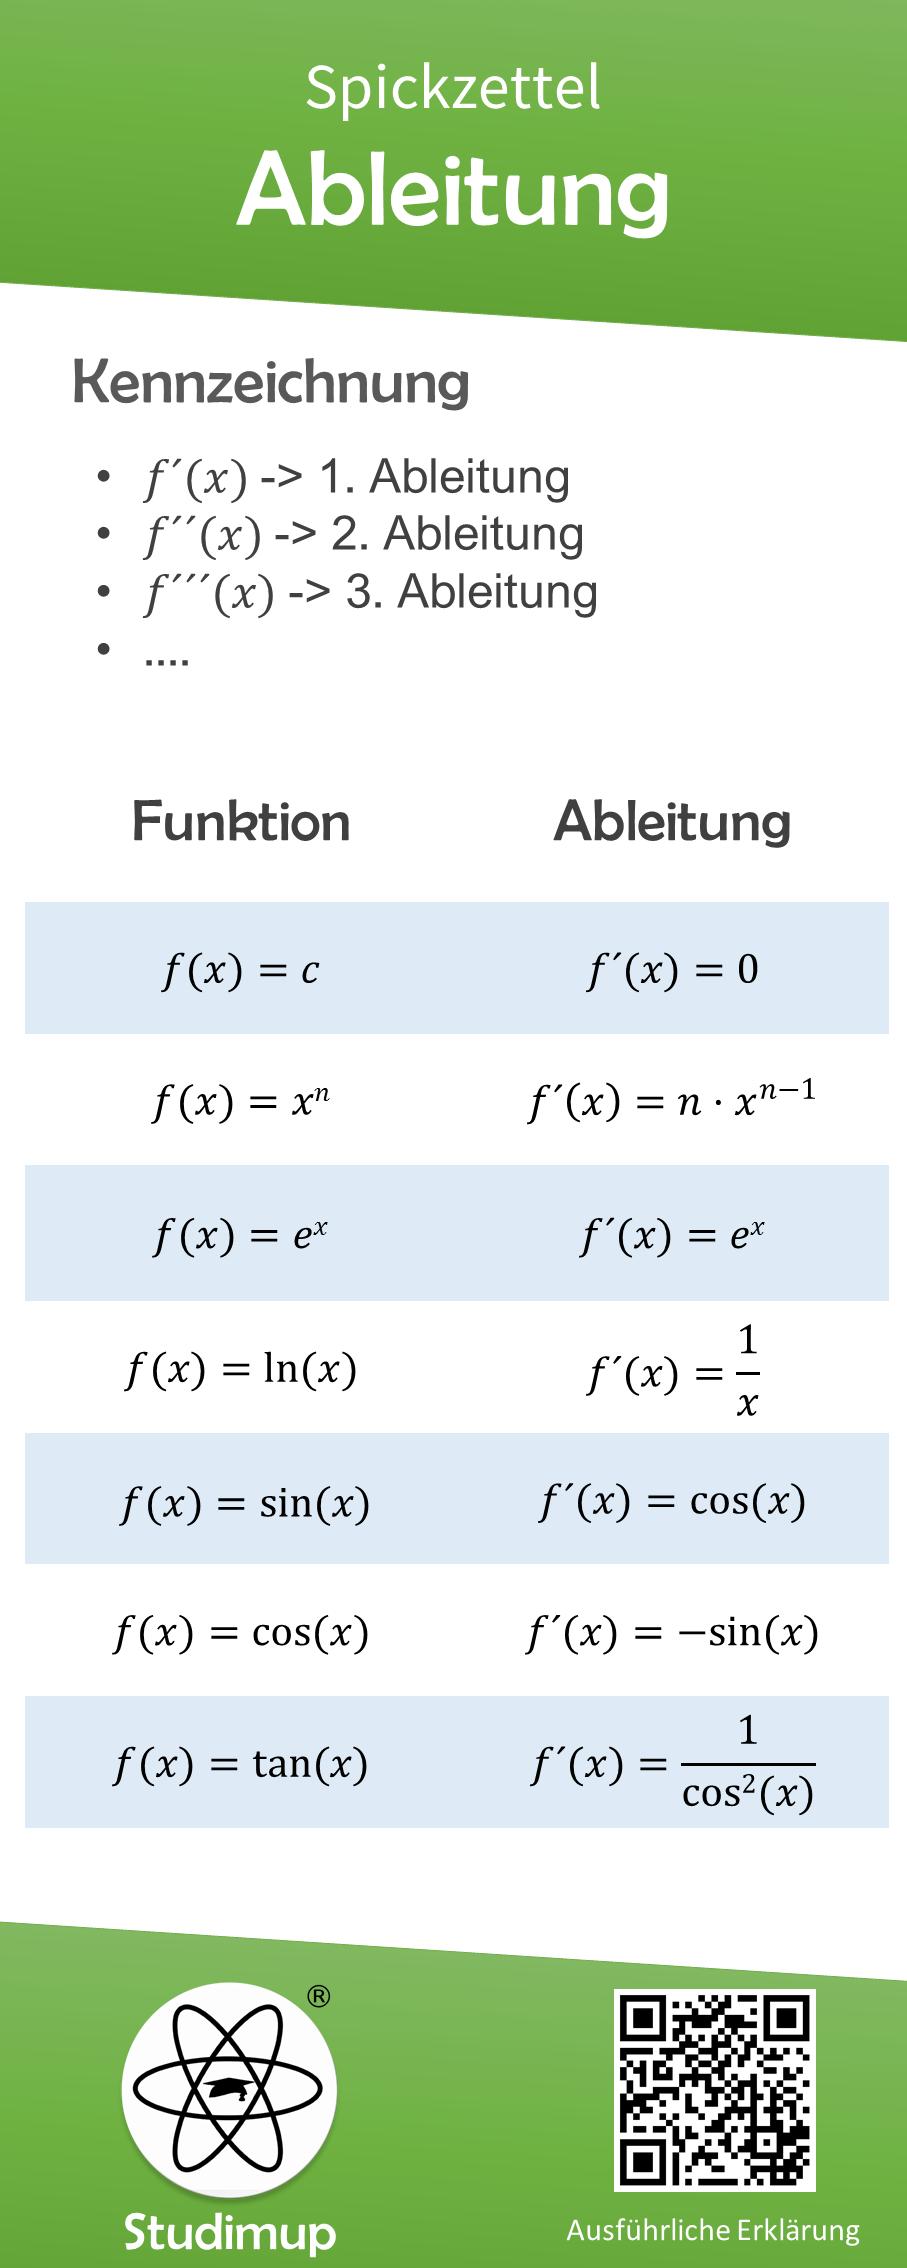 Ableitung Mathe Spickzettel Nachhilfe Mathe Spickzettel Mathe Formeln